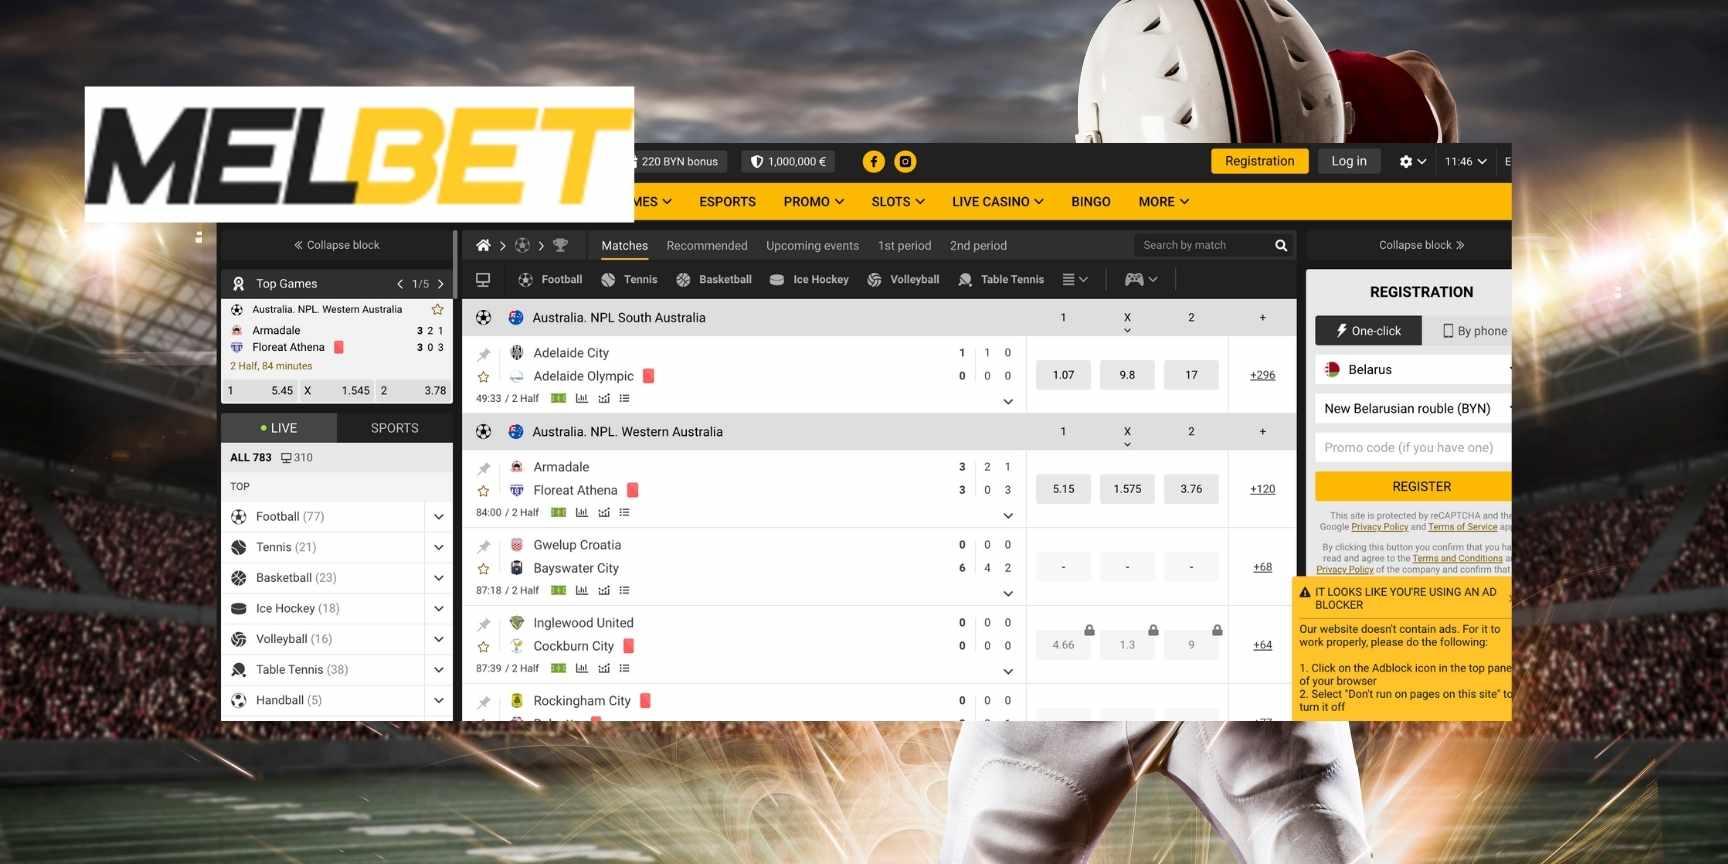 melbet website review